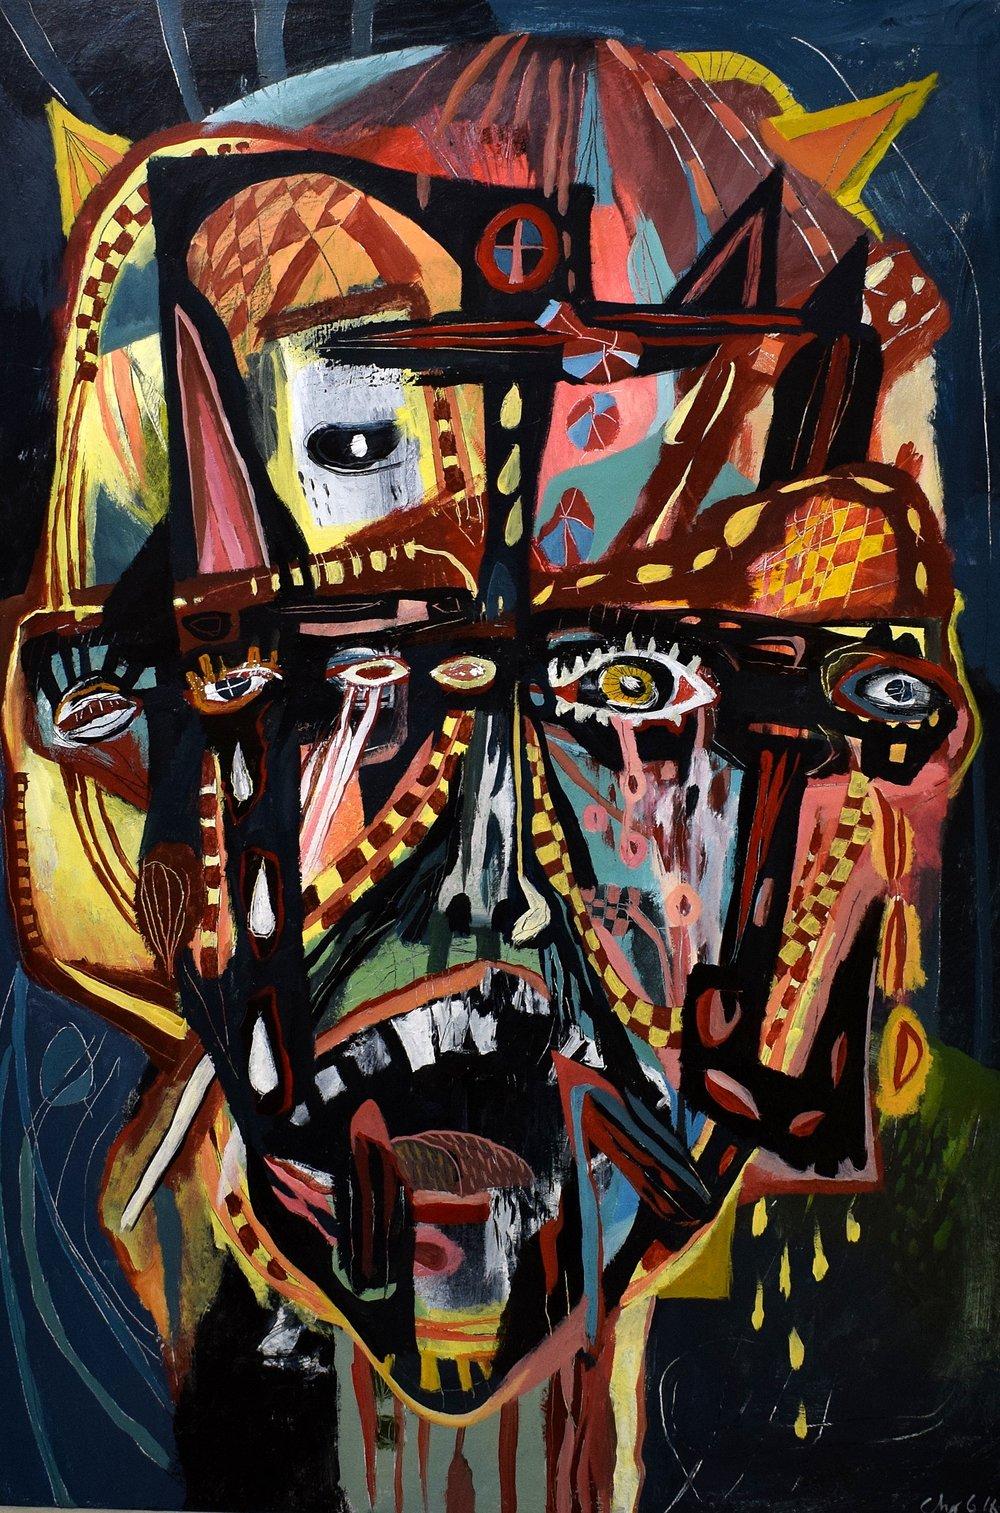 Losing sanity, Acrylics, 80x100cm, 2016